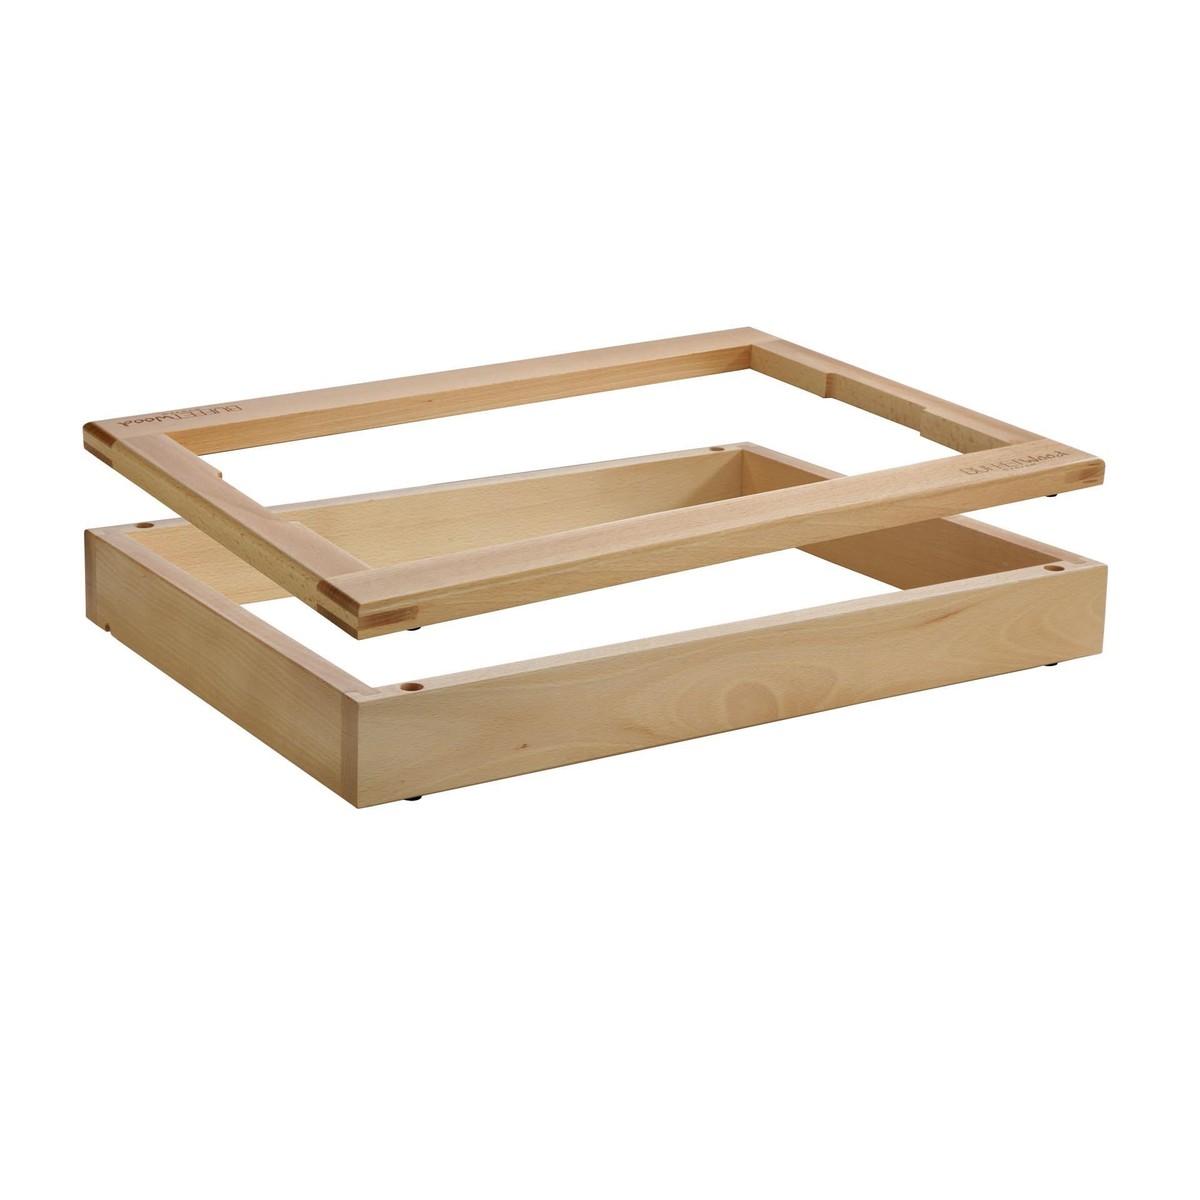 Basiselement + Rahmen 2er-Set, 1/1 GN